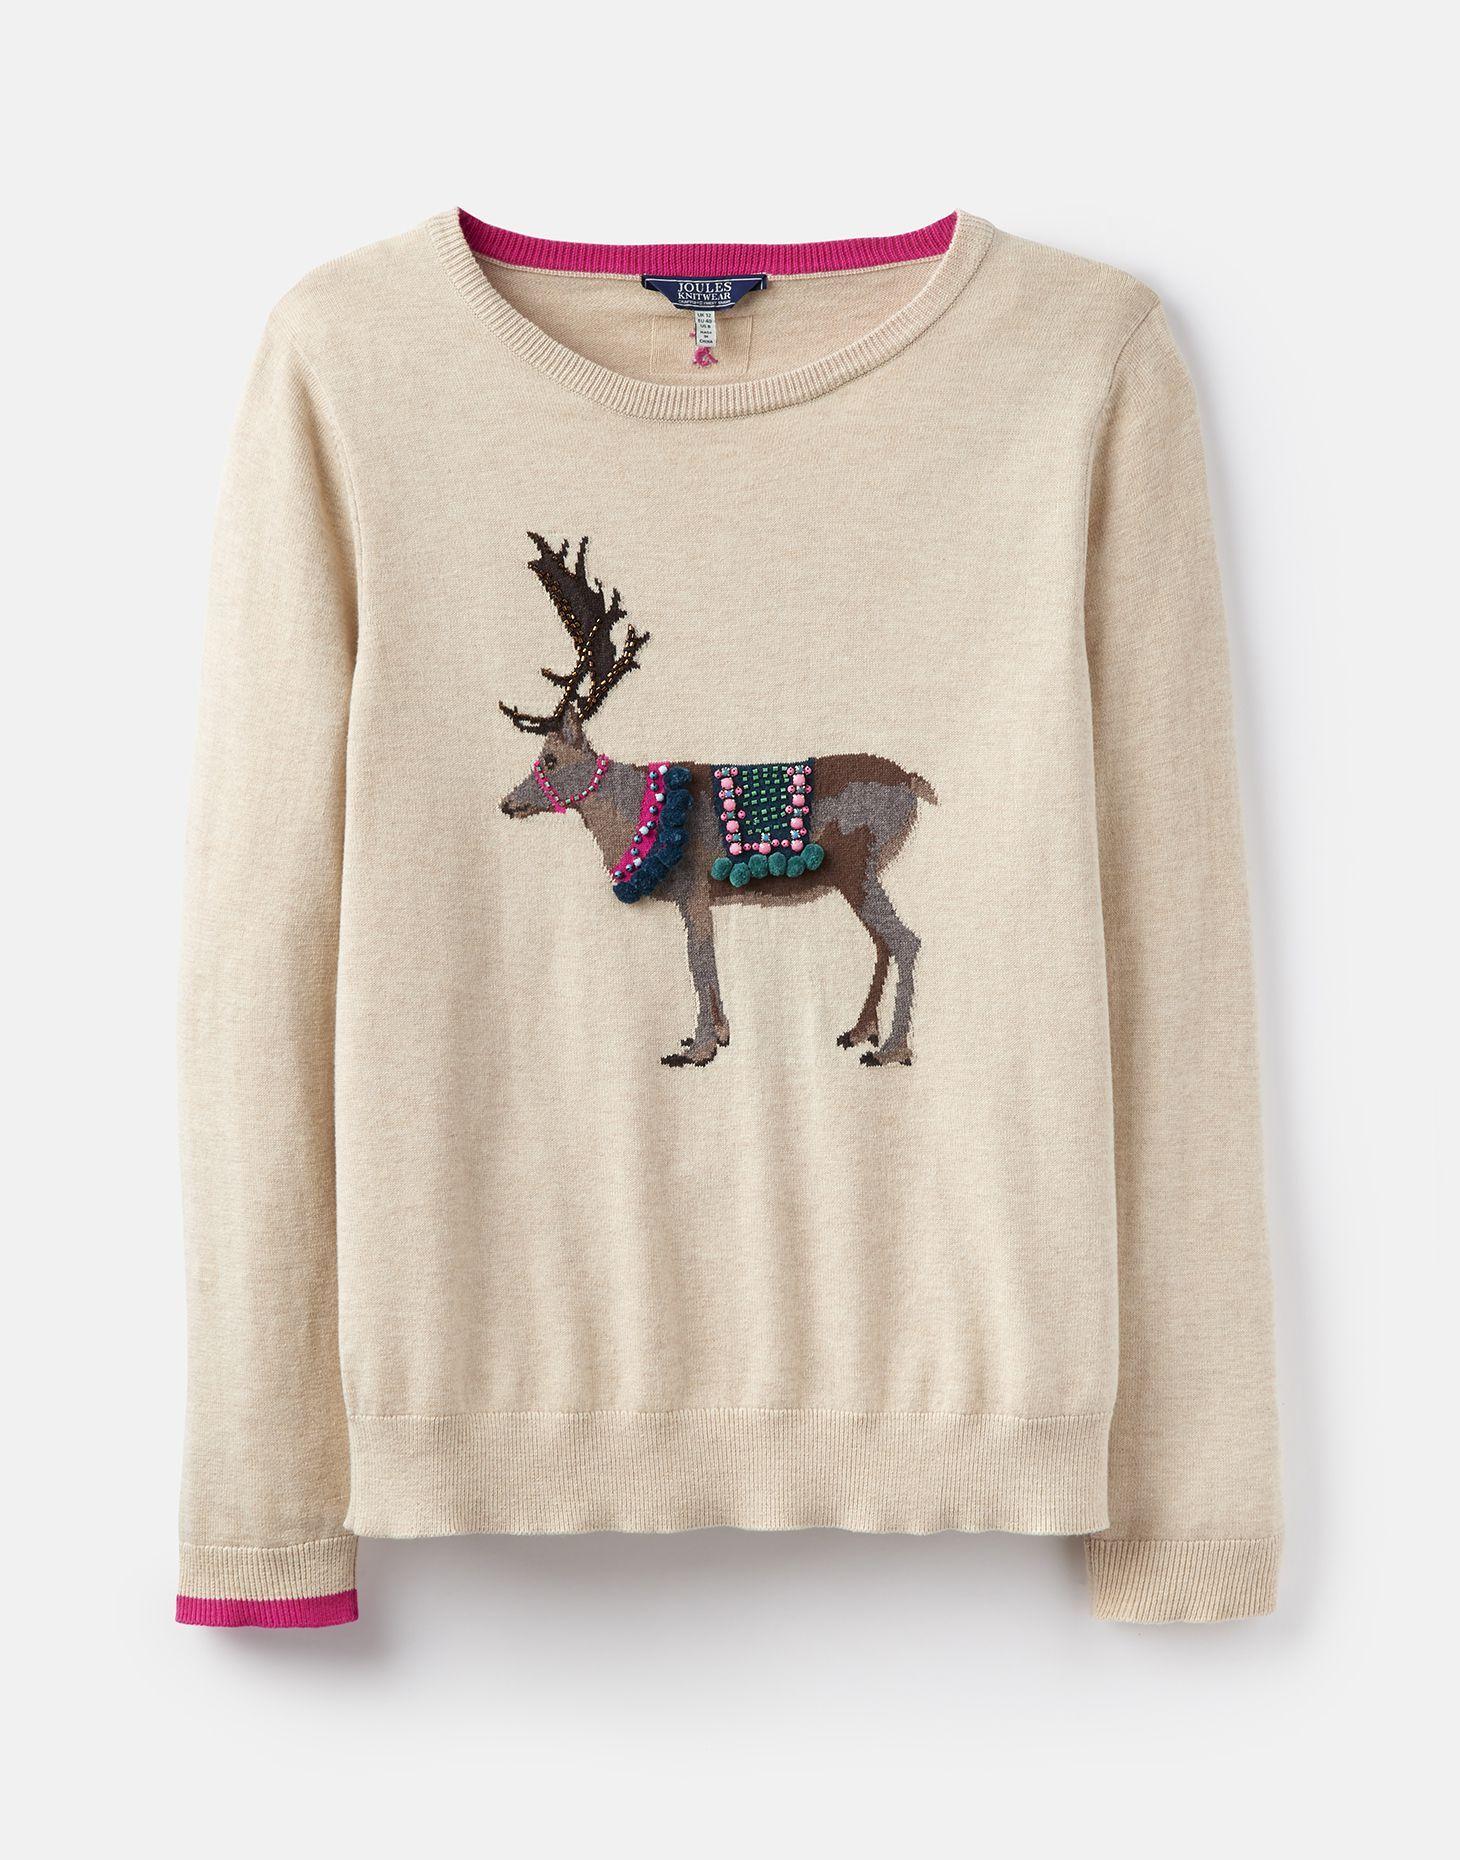 Festive Luxe Oat Reindeer Intarsia Jumper Joules Us Sweaters For Women Sweaters Jumper [ 1860 x 1460 Pixel ]